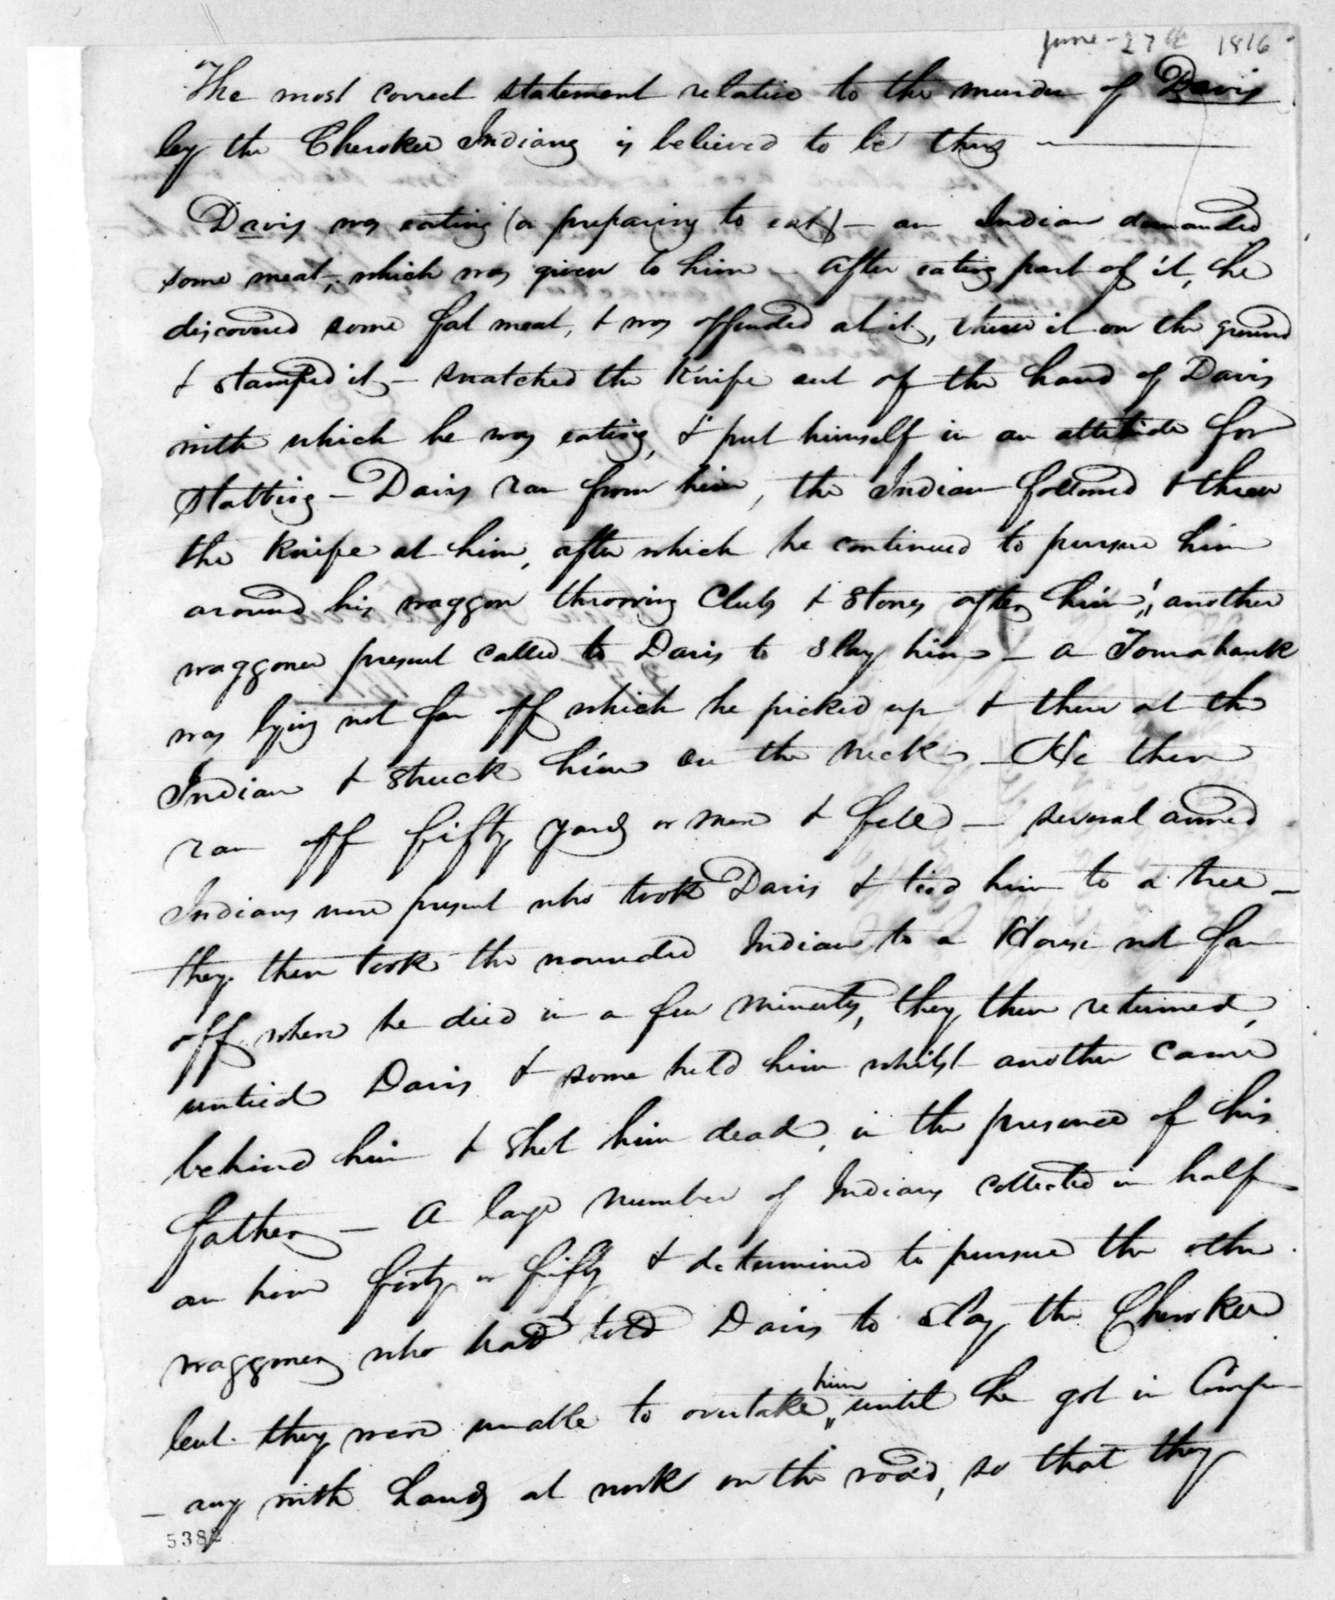 John Patton Erwin, June 27, 1816